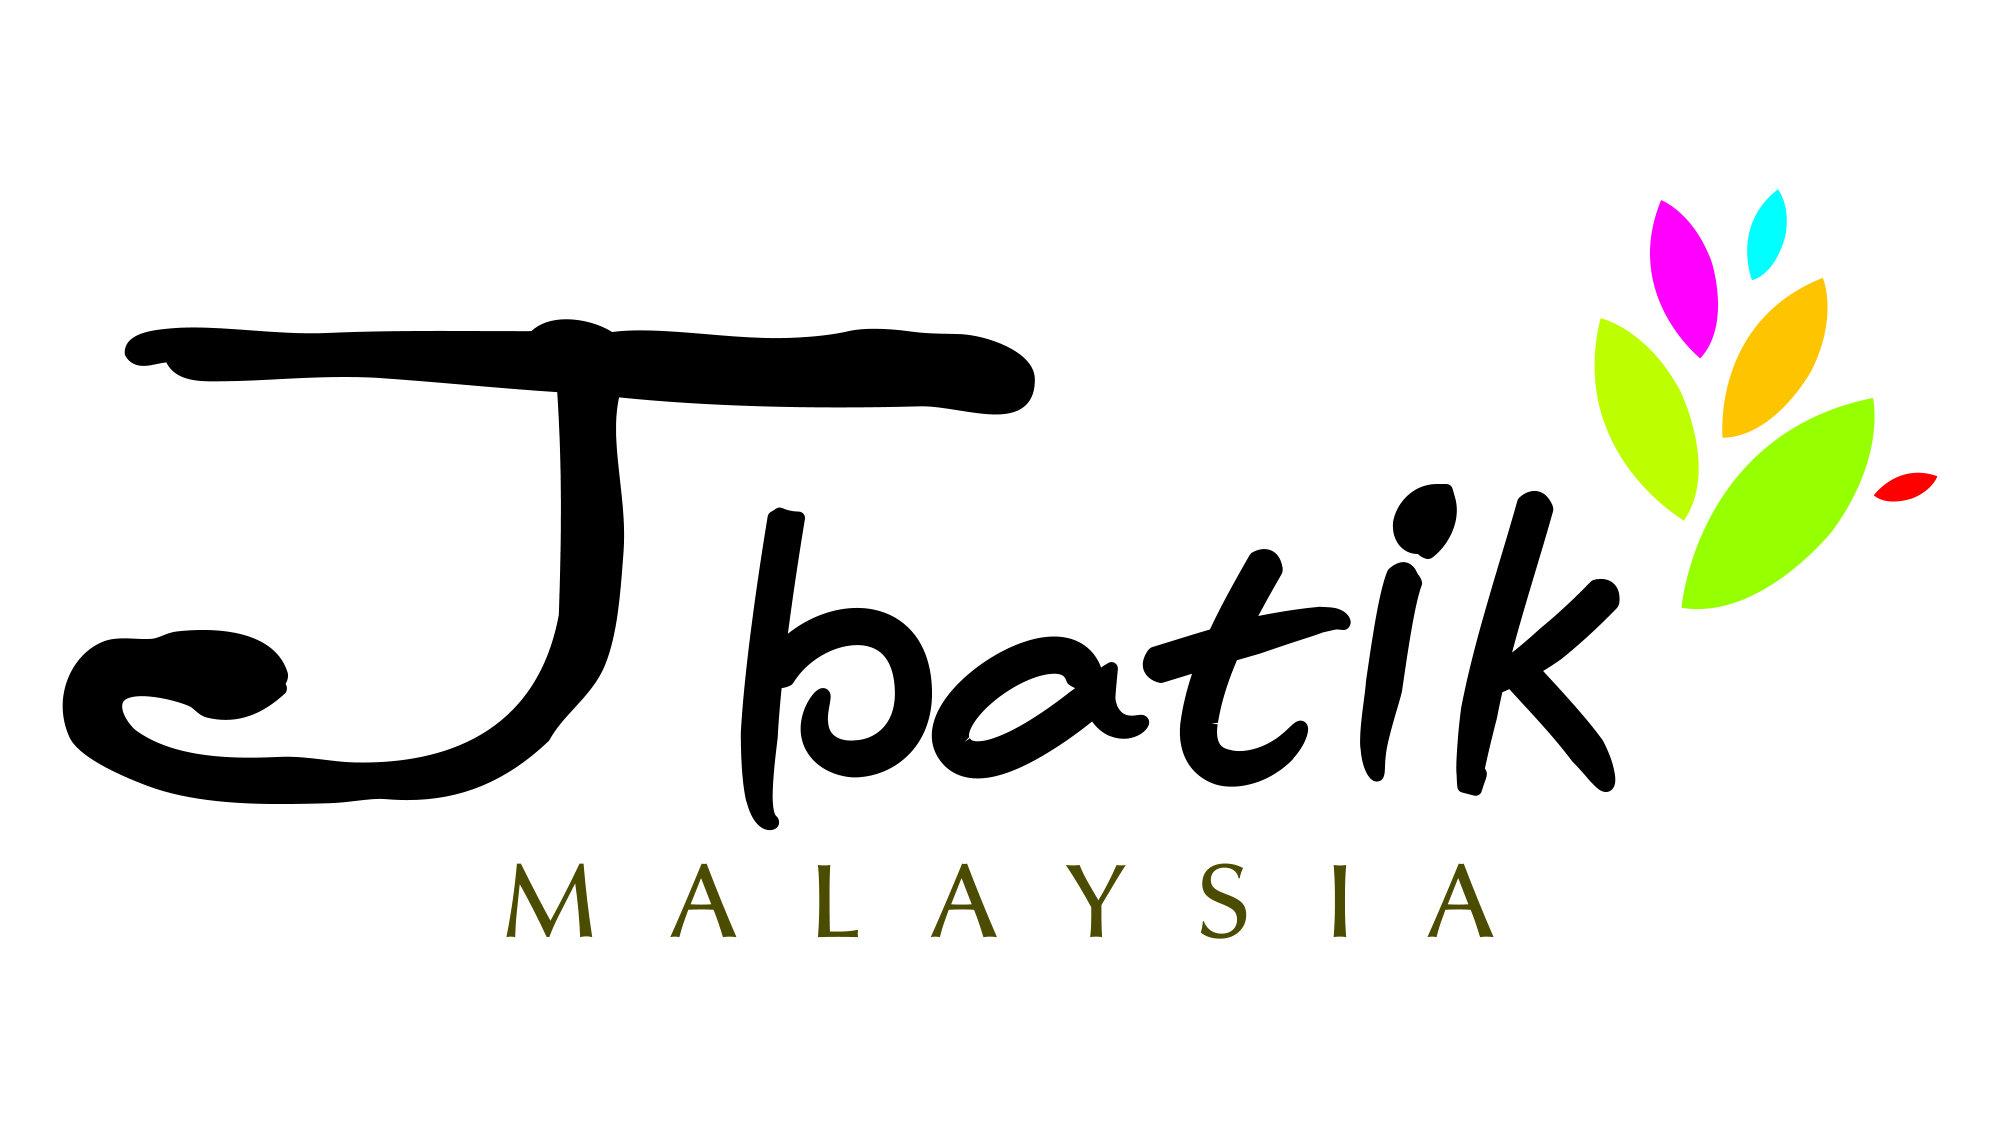 J Batik Malaysia Logo Mark Artist Joey Kher Batik Art Batu Pahat Johor Malaysia A01